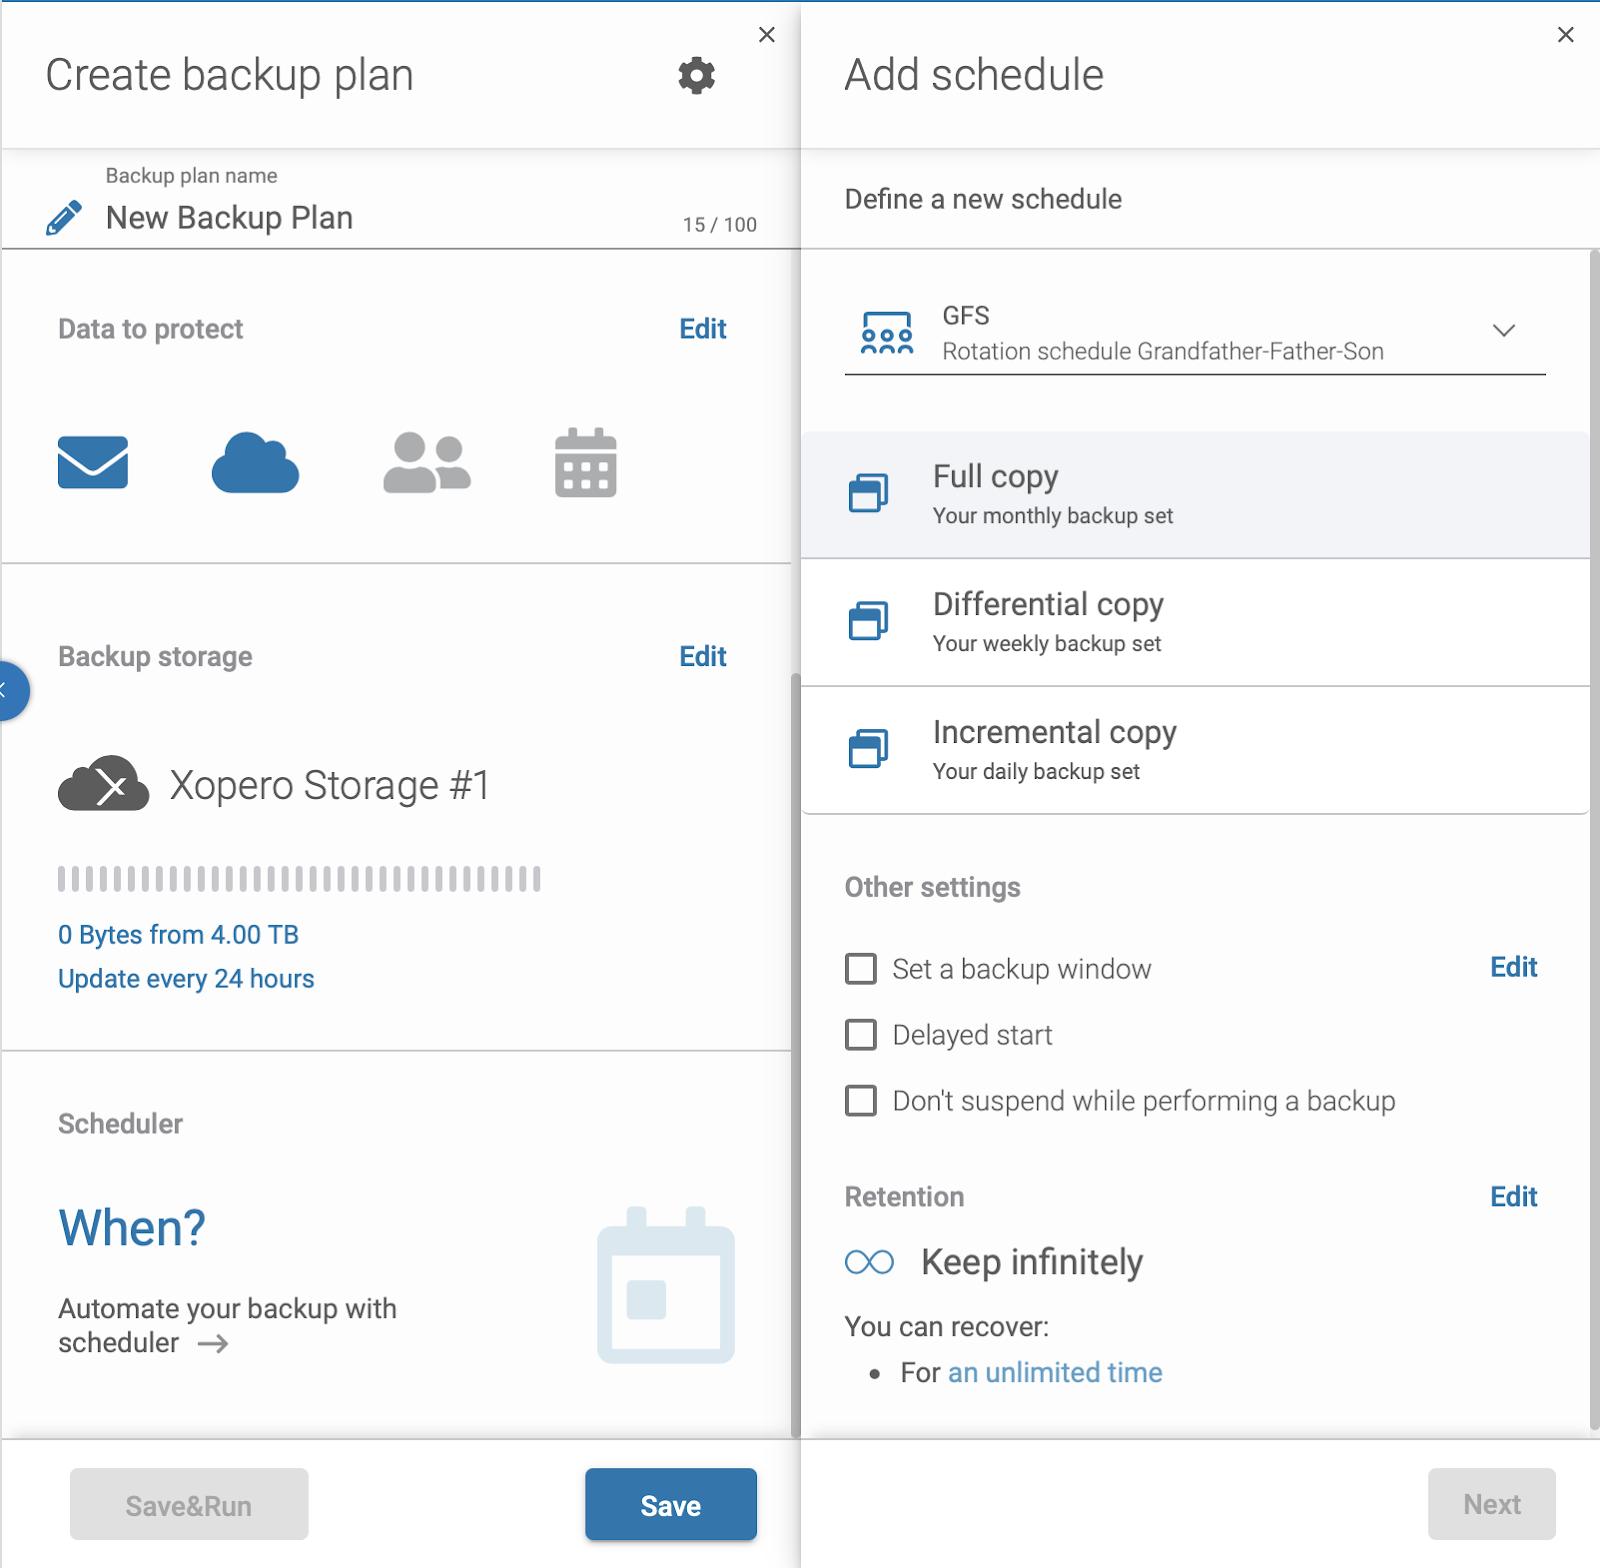 Microsoft 365 backup plan - schedule settings